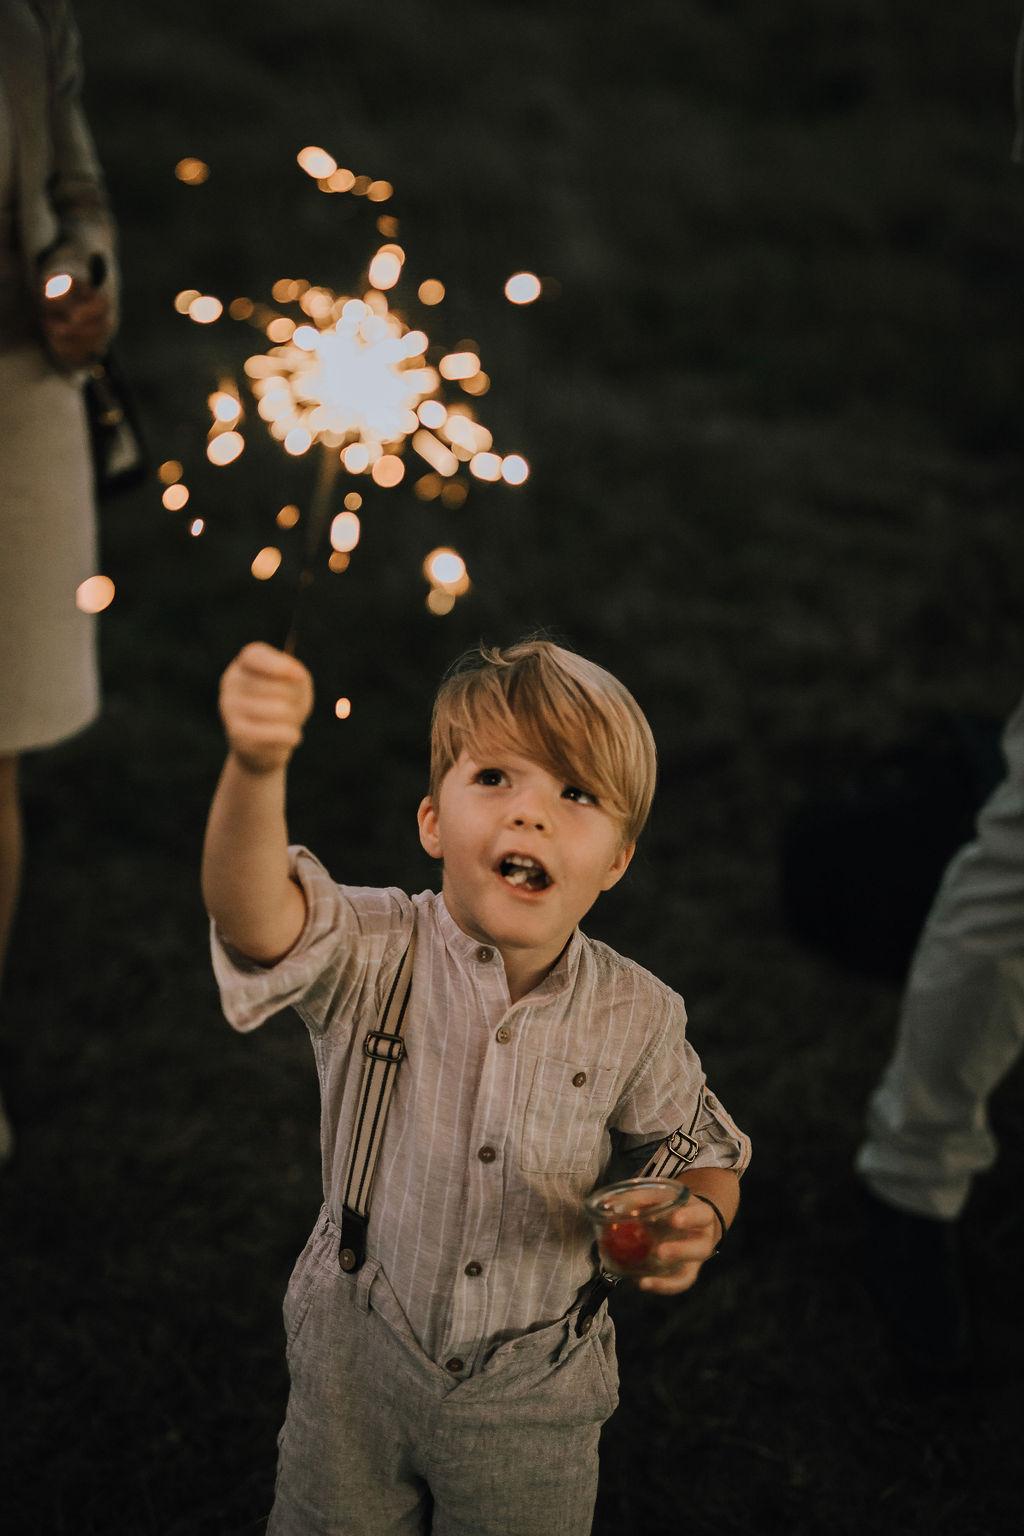 Styled Shoot Boho Hochzeit, Kind mit Wunderkerze